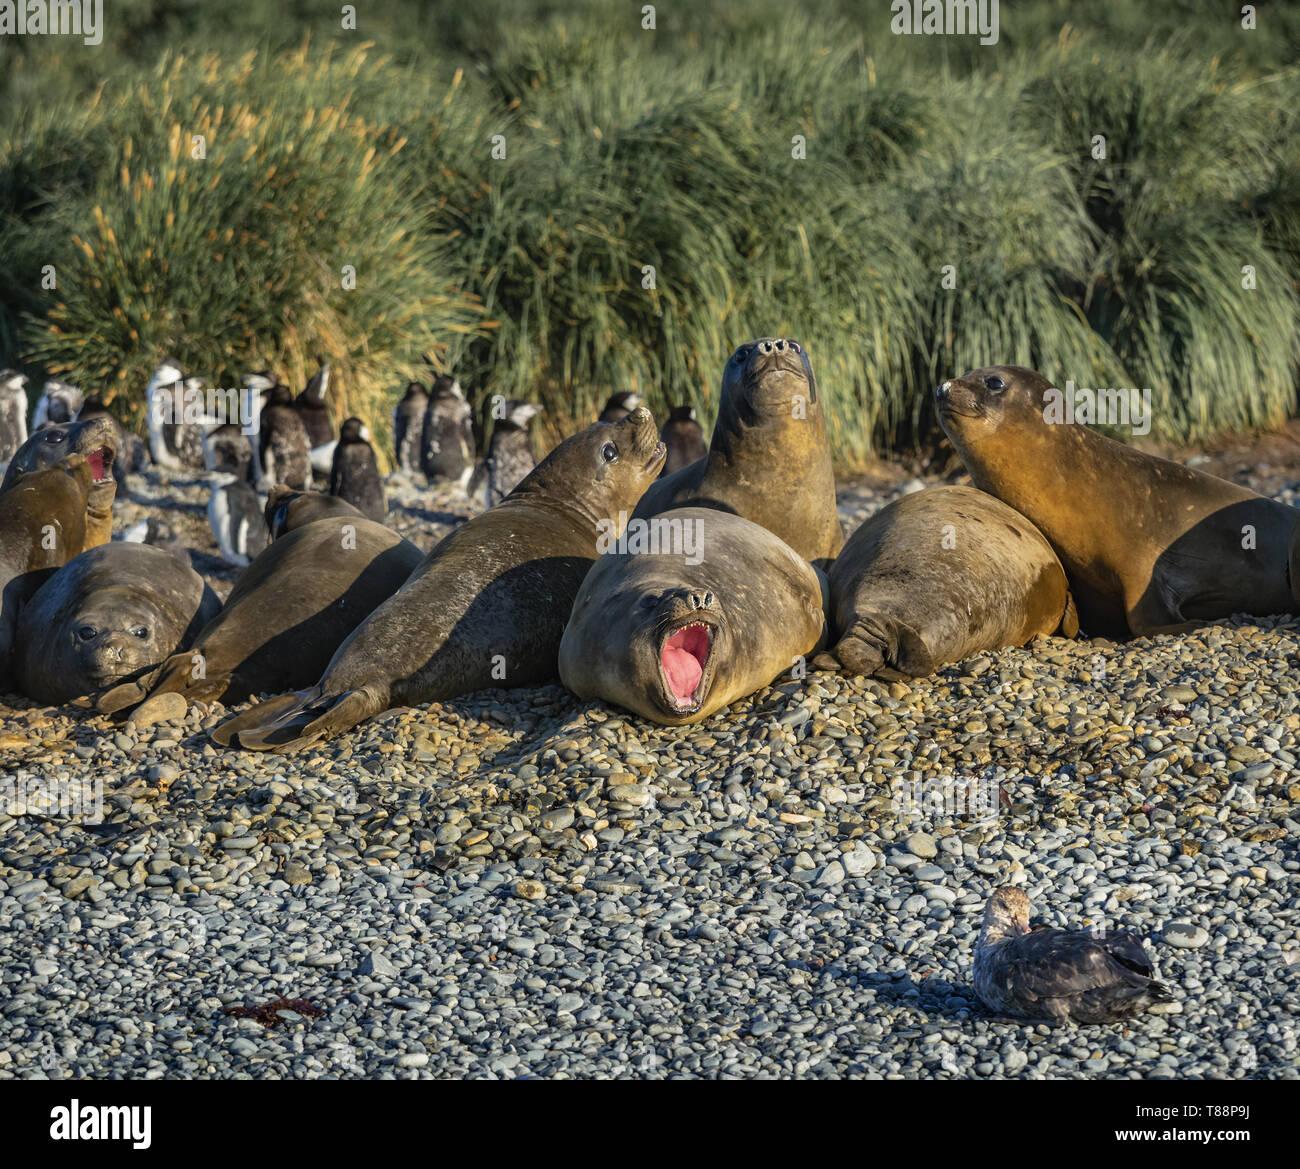 Seal Pup Aggression Stockbild